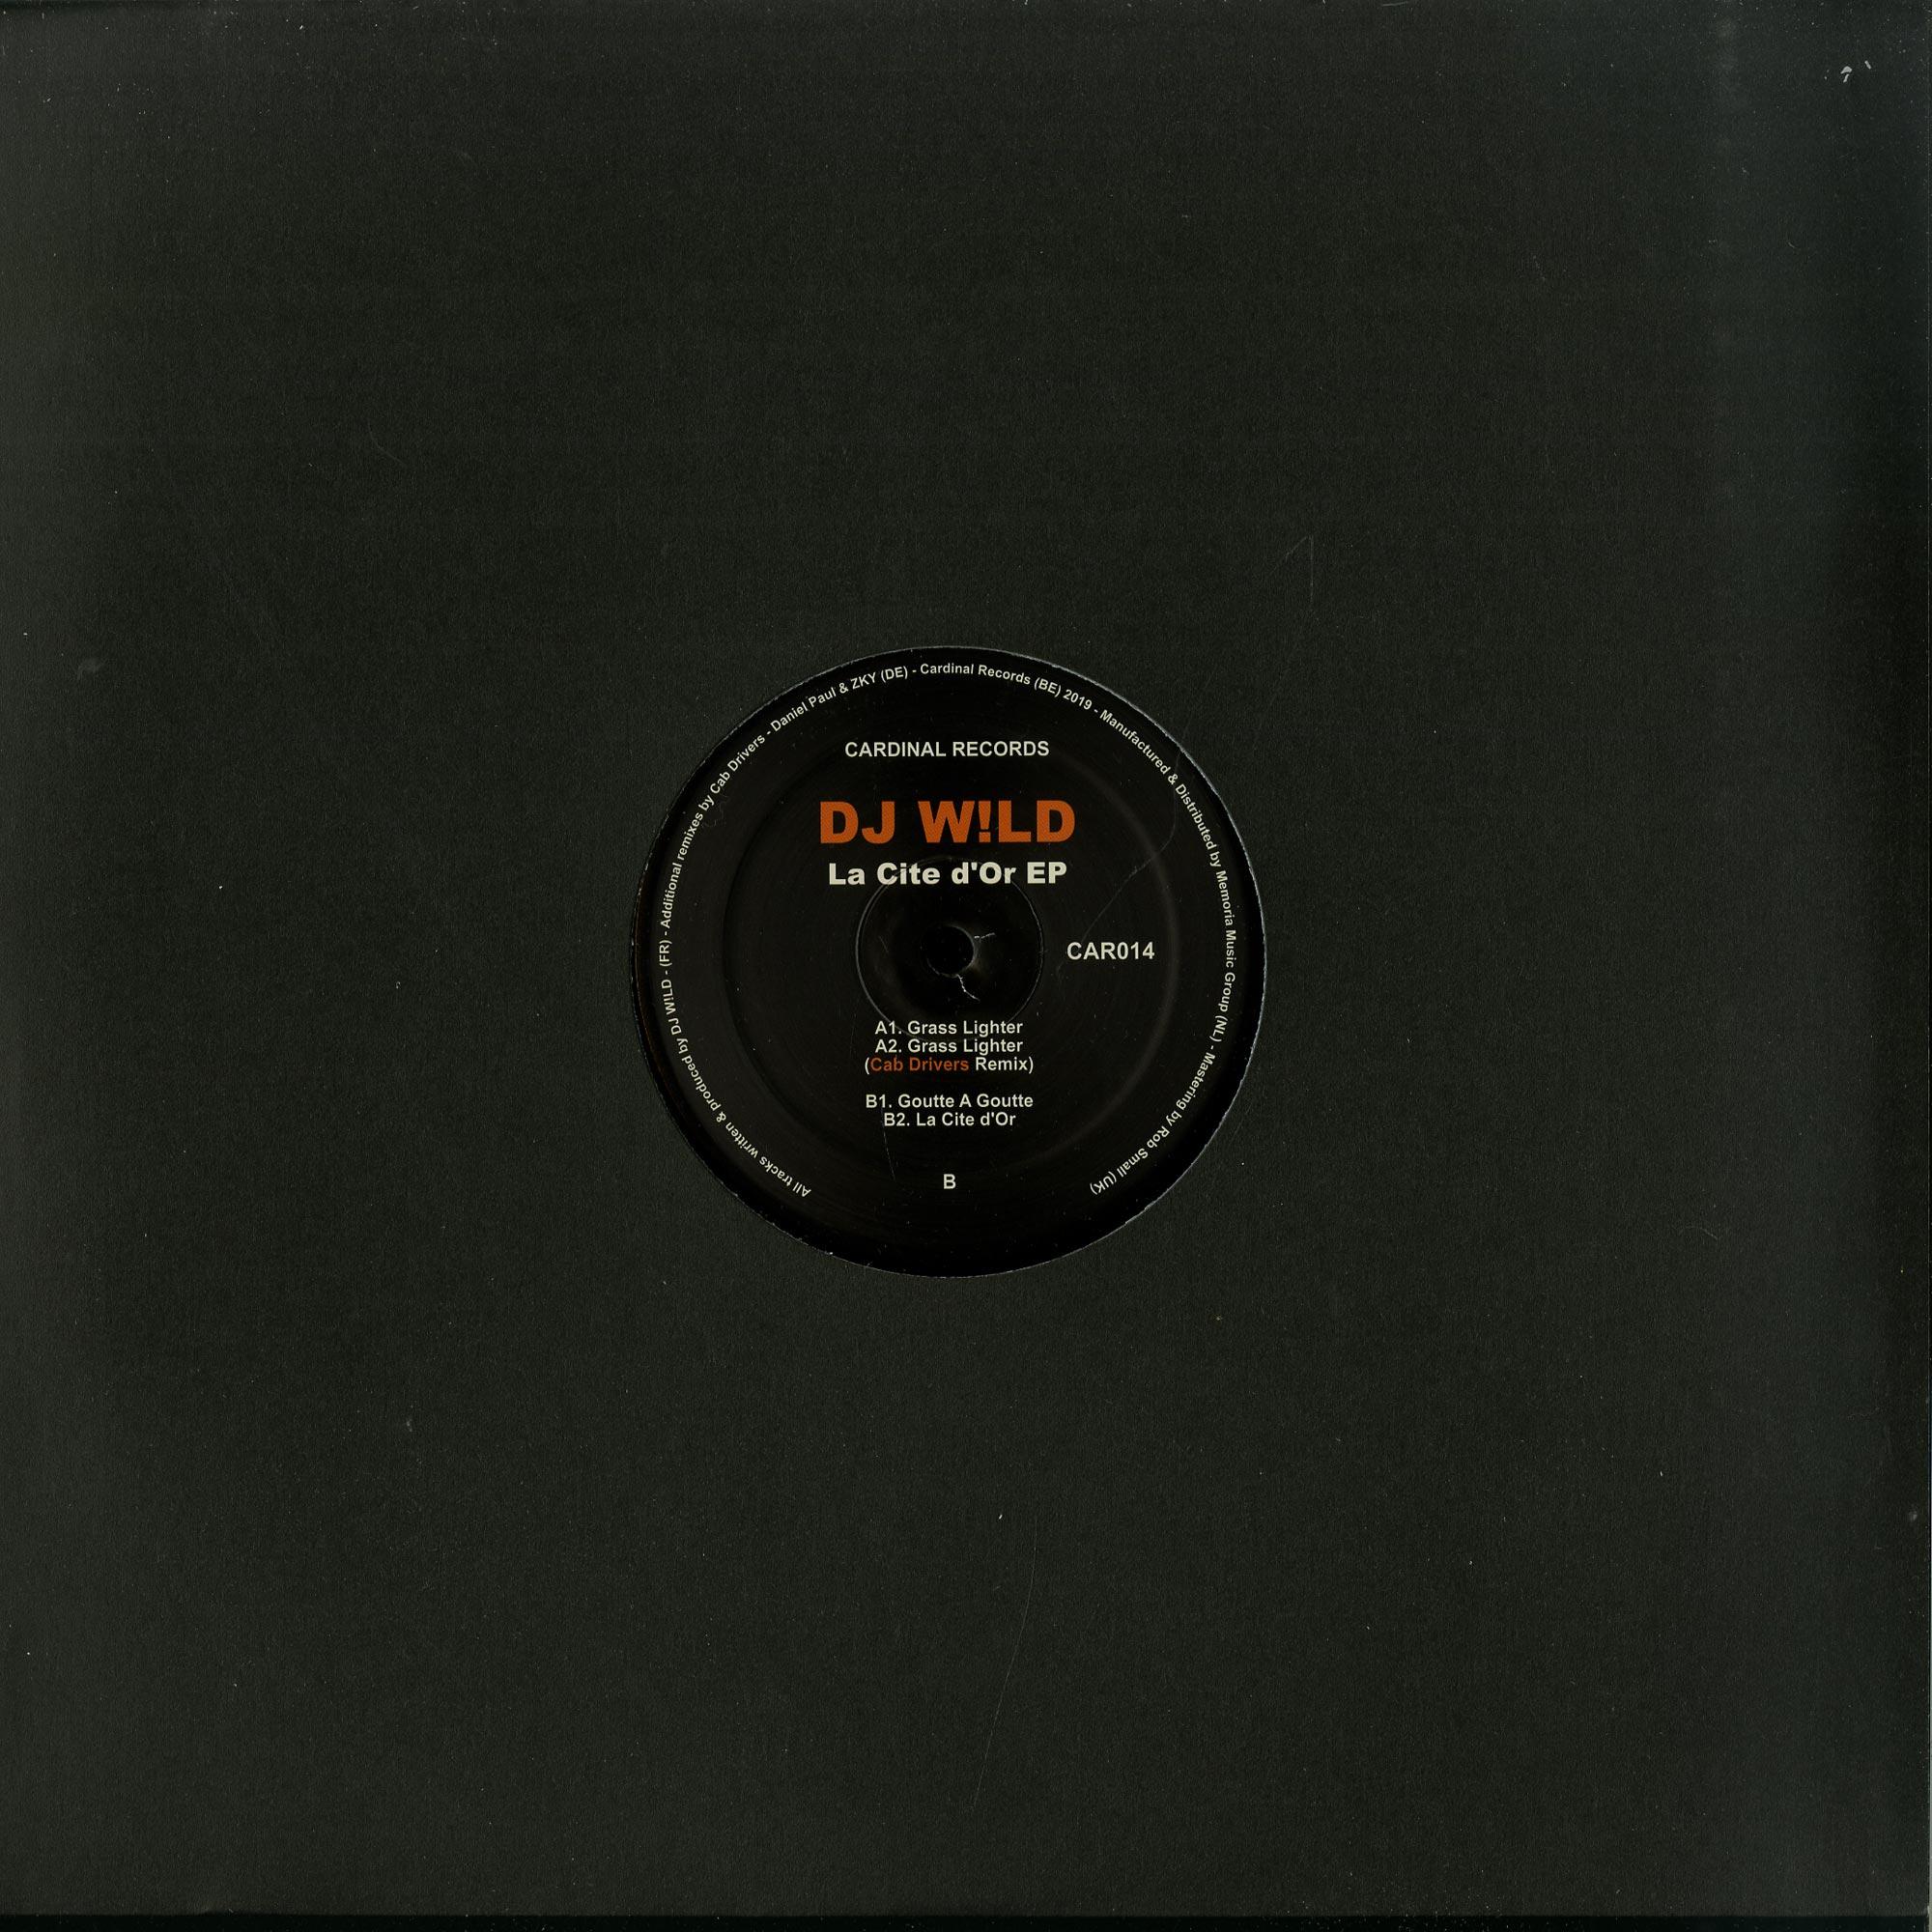 DJ W!LD - LA CITE DOR EP